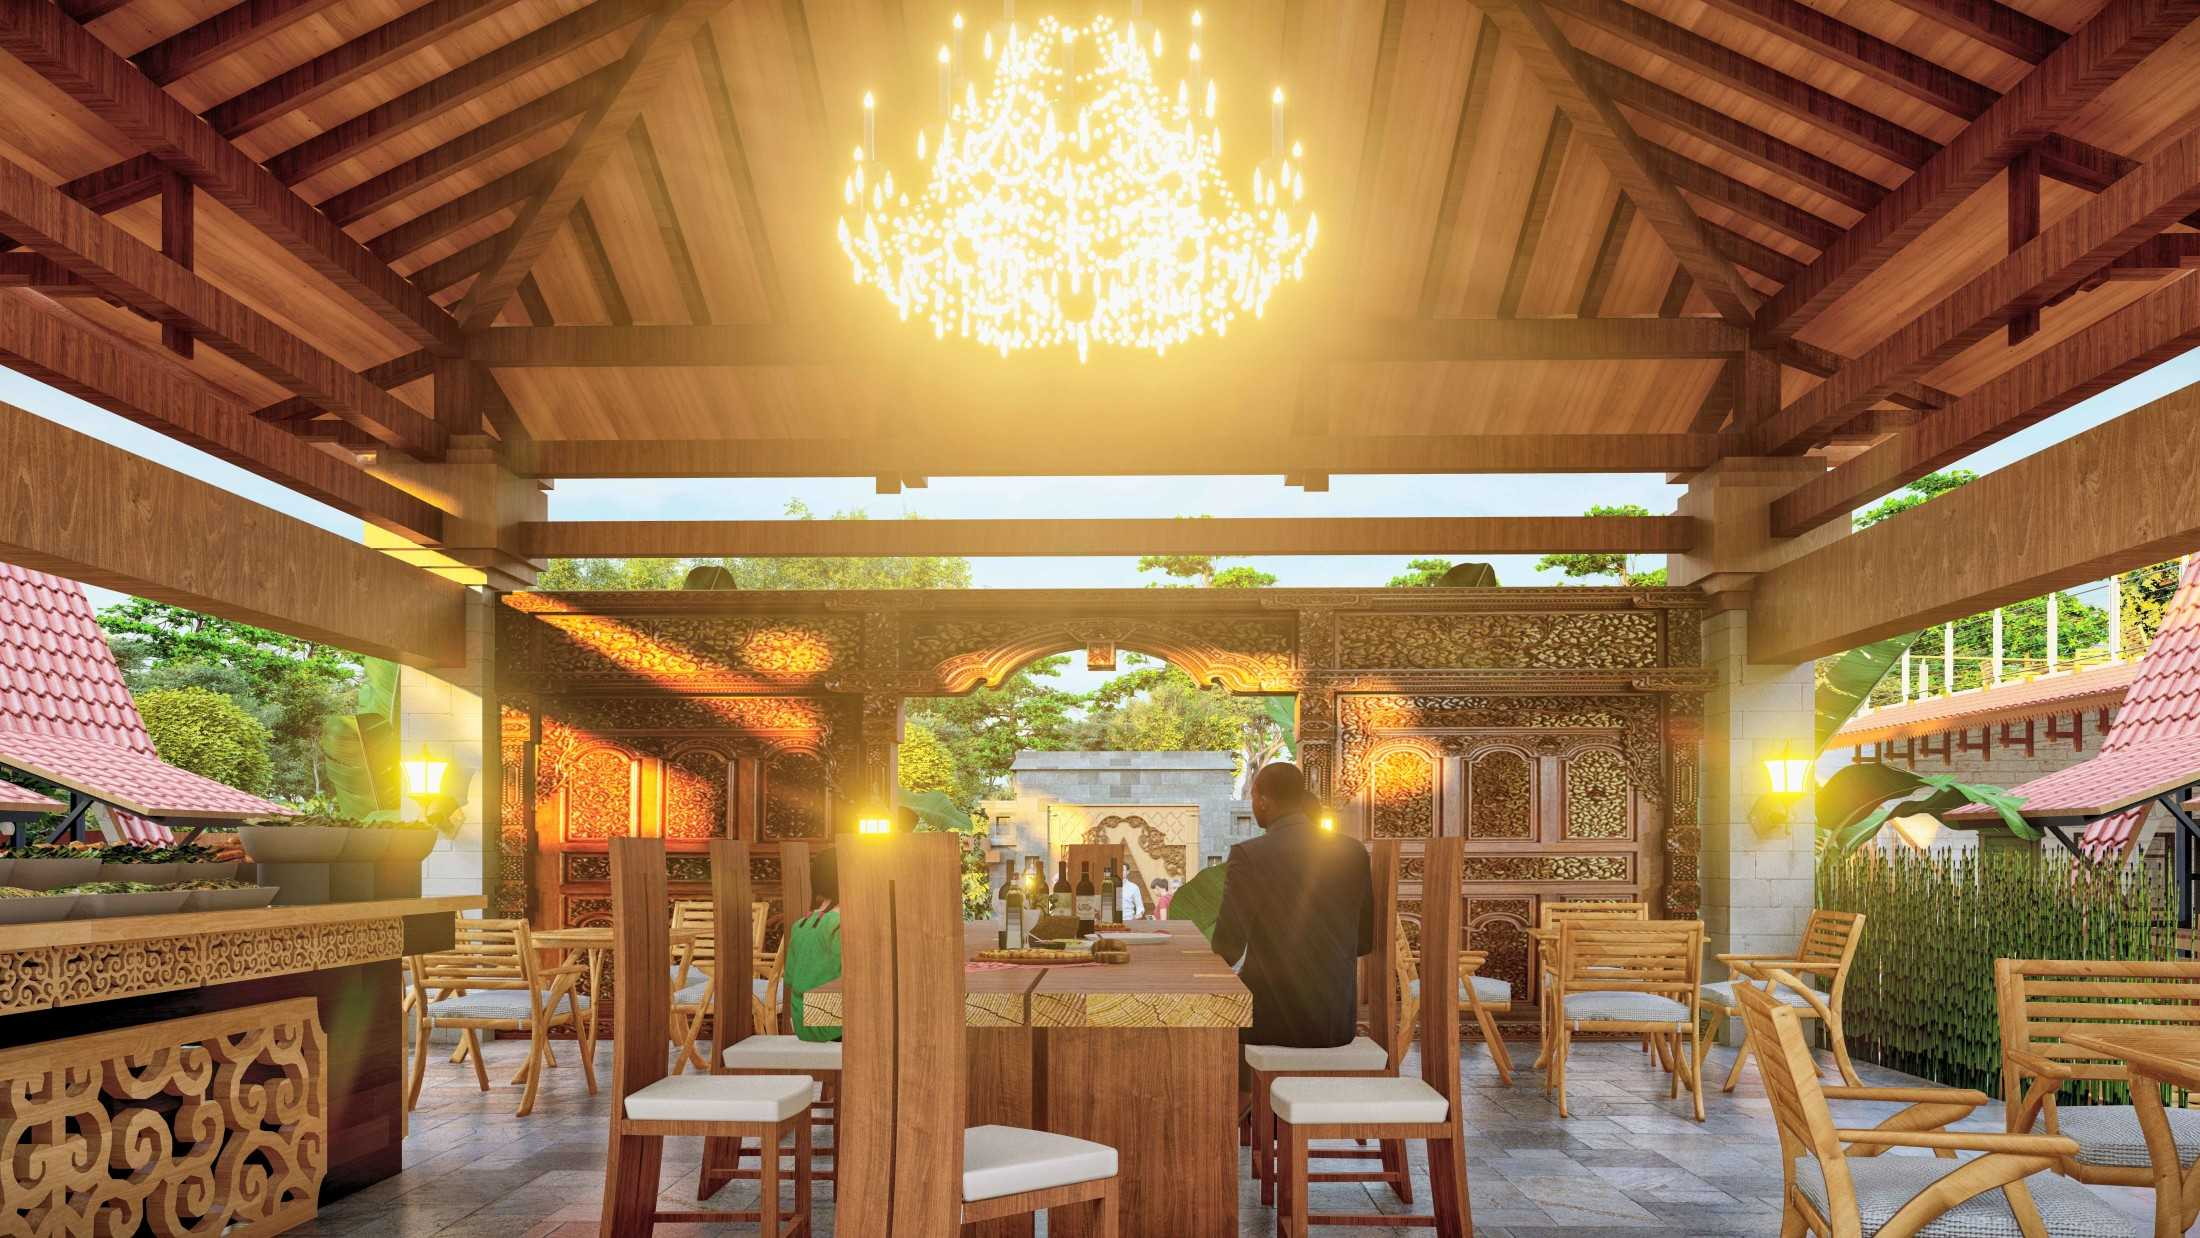 Sinan Arsitek Desain Restaurant & Cafe Crito Kulo Jakarta, Daerah Khusus Ibukota Jakarta, Indonesia Jakarta, Daerah Khusus Ibukota Jakarta, Indonesia Sinan-Arsitek-Desain-Restaurant-Cafe-Crito-Kulo  117702